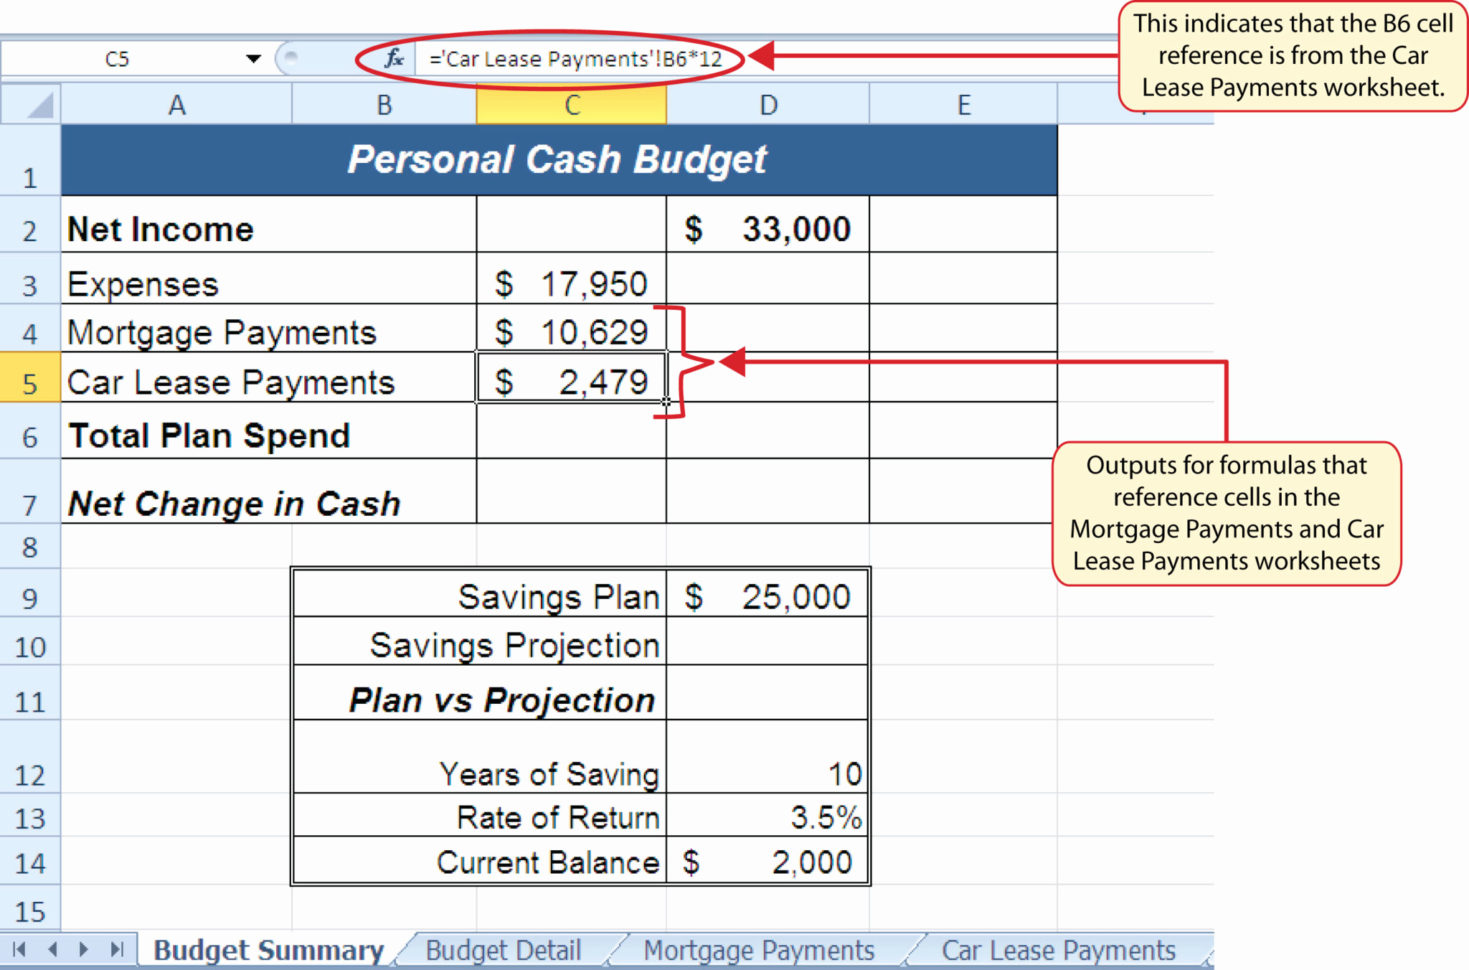 Equipment Lease Calculator Excel Spreadsheet Throughout Equipment Lease Calculator Excel Spreadsheet And Equipment Lease